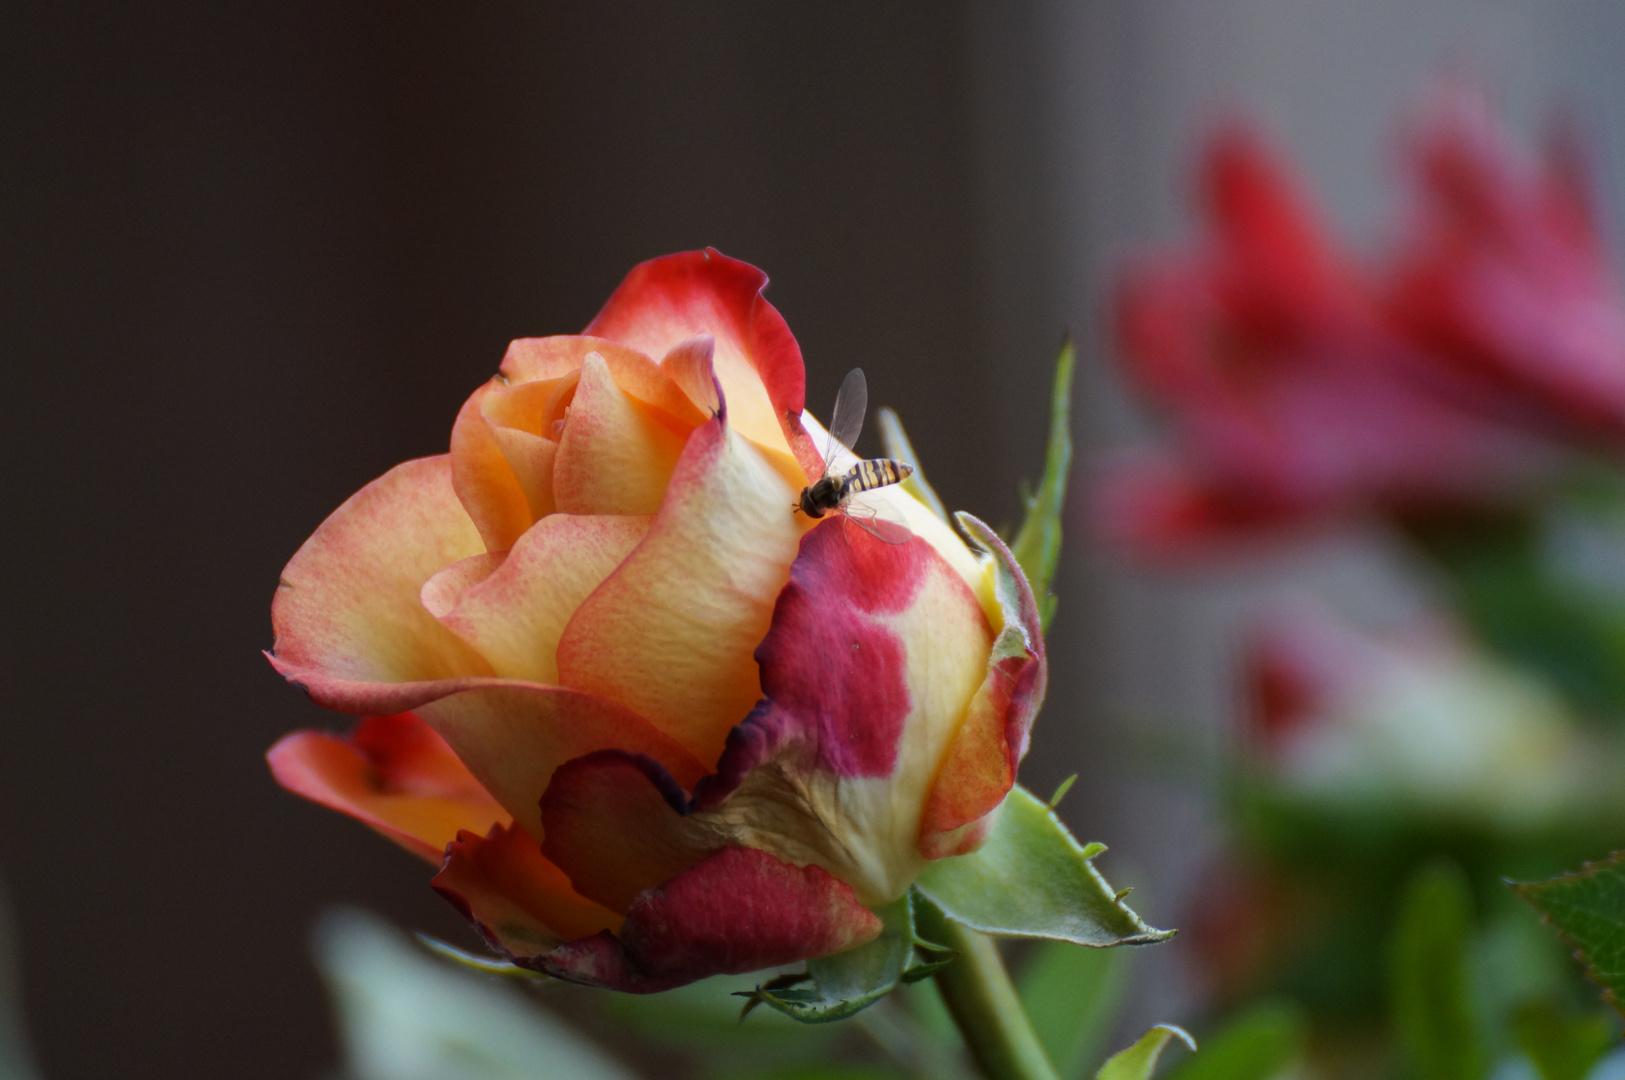 Wespe und Rose